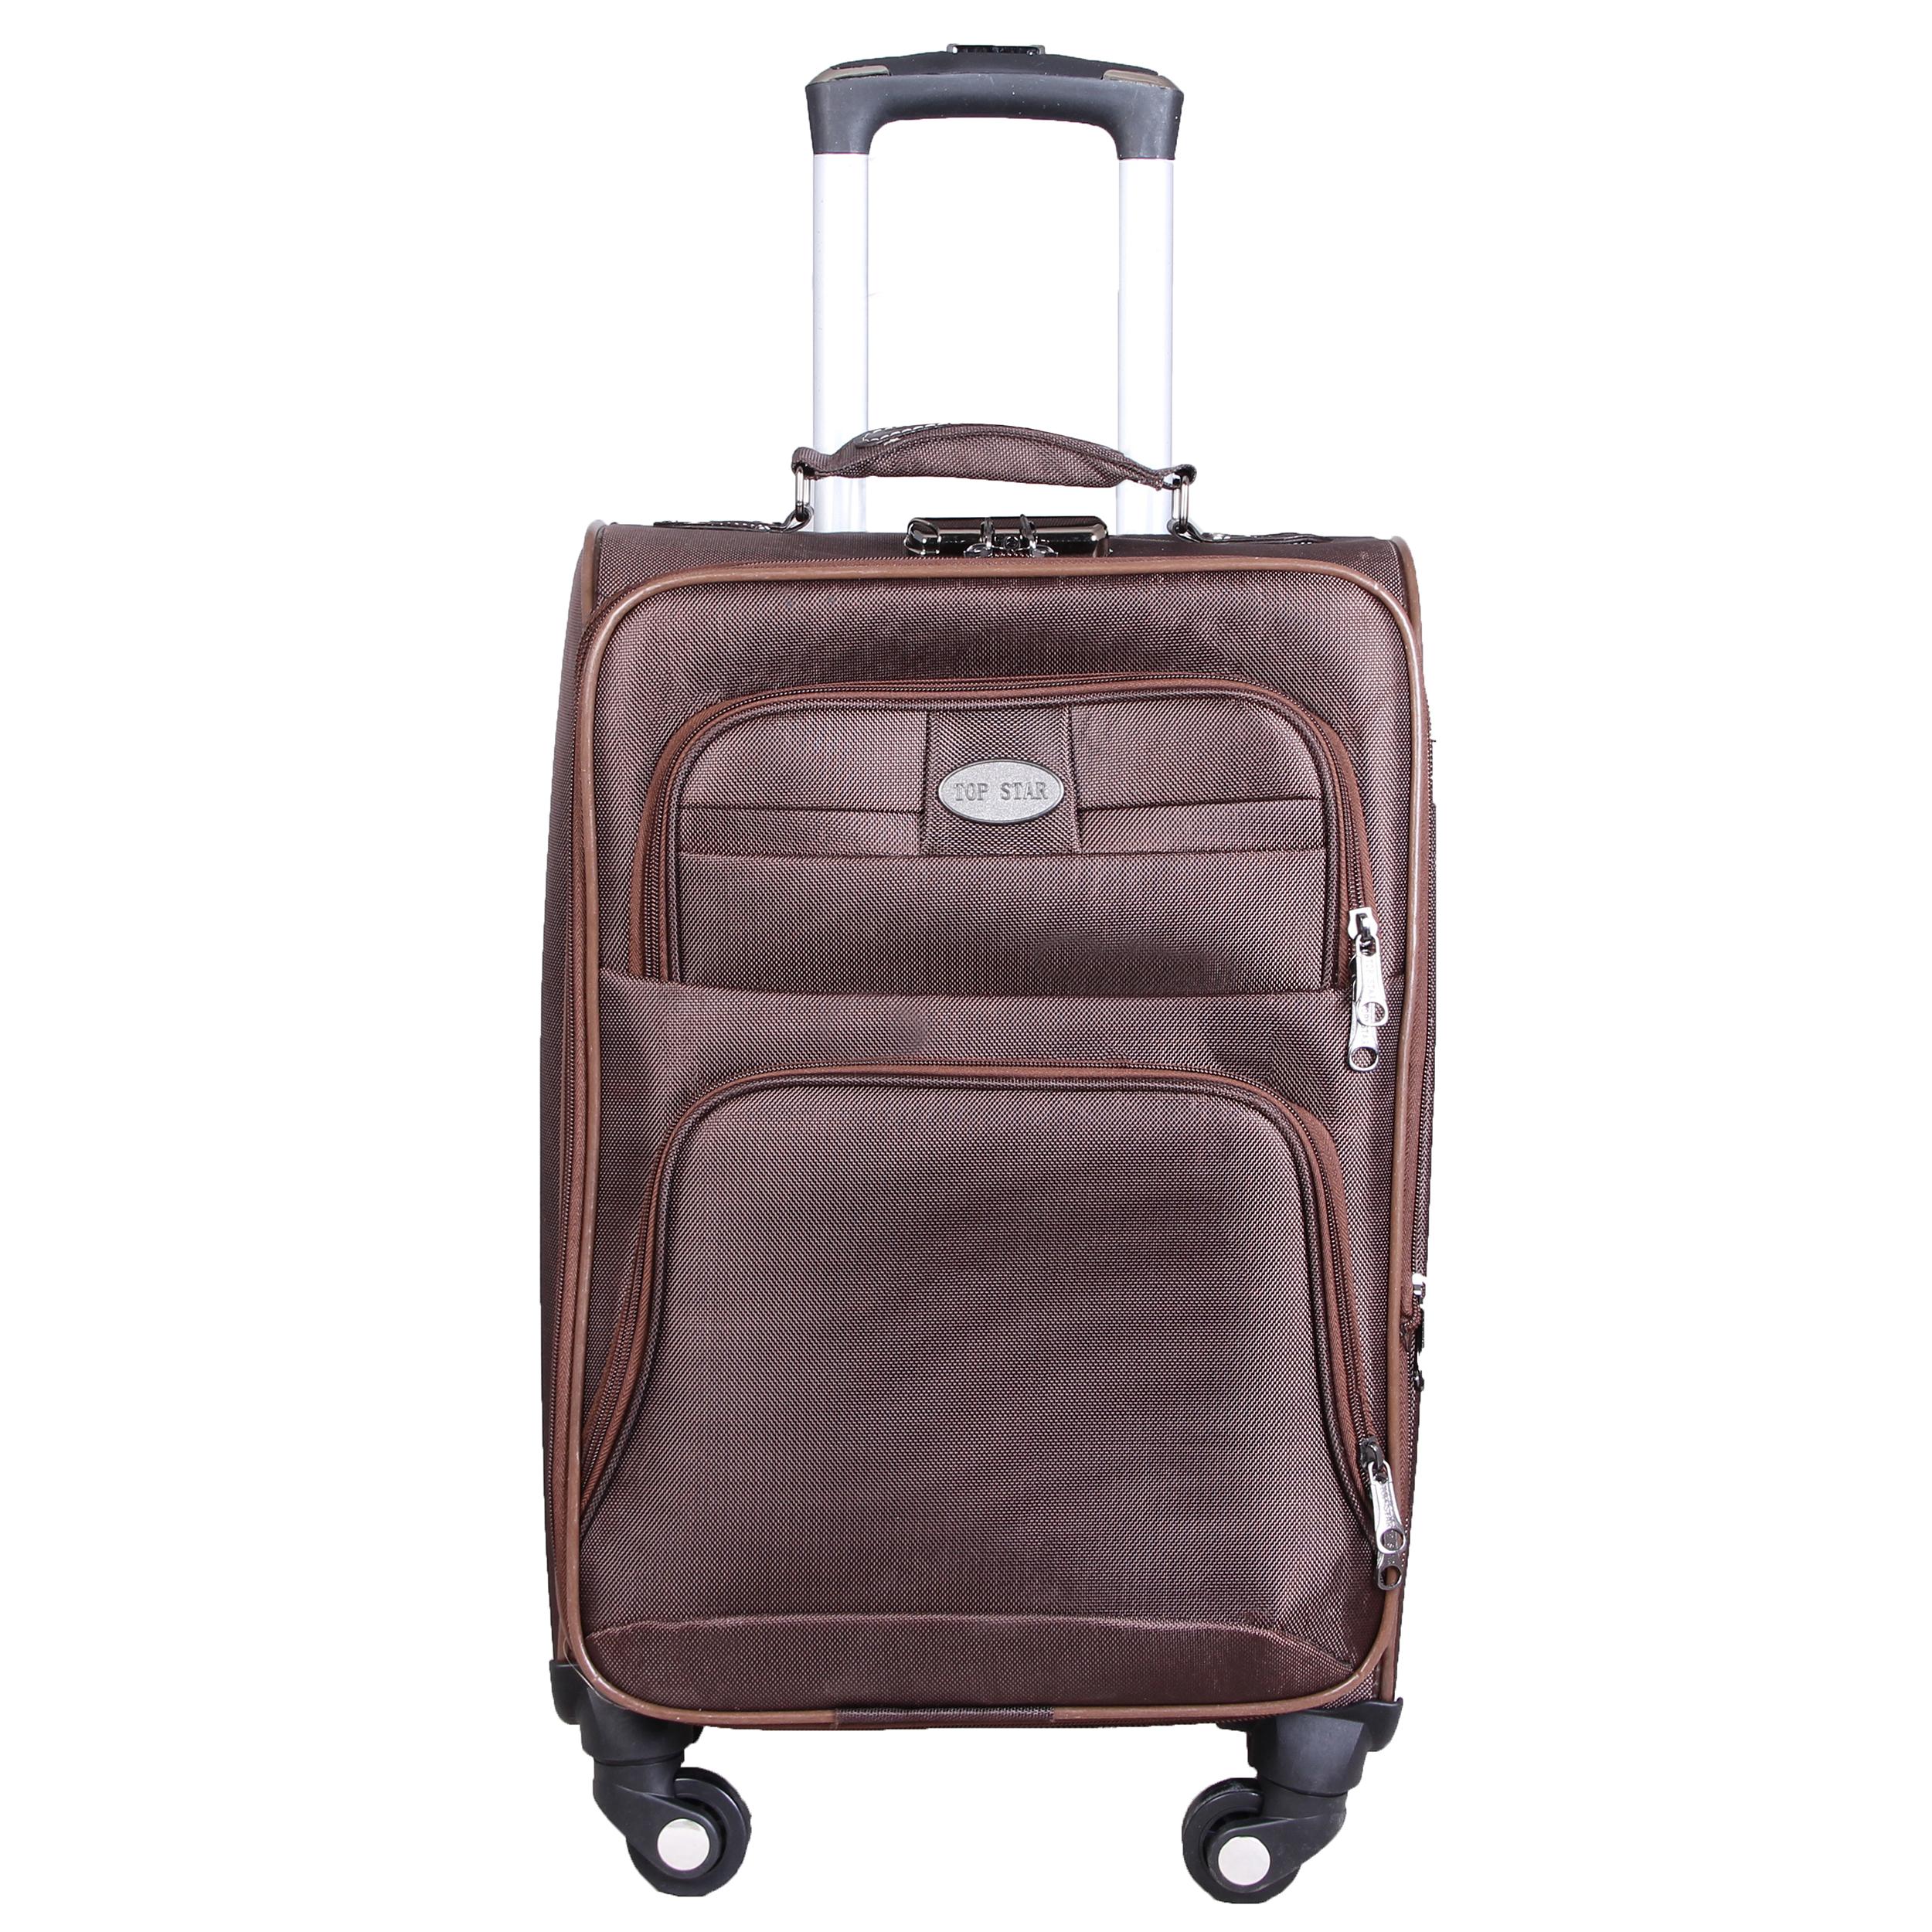 چمدان کد 1-A1034 سایز کوچک